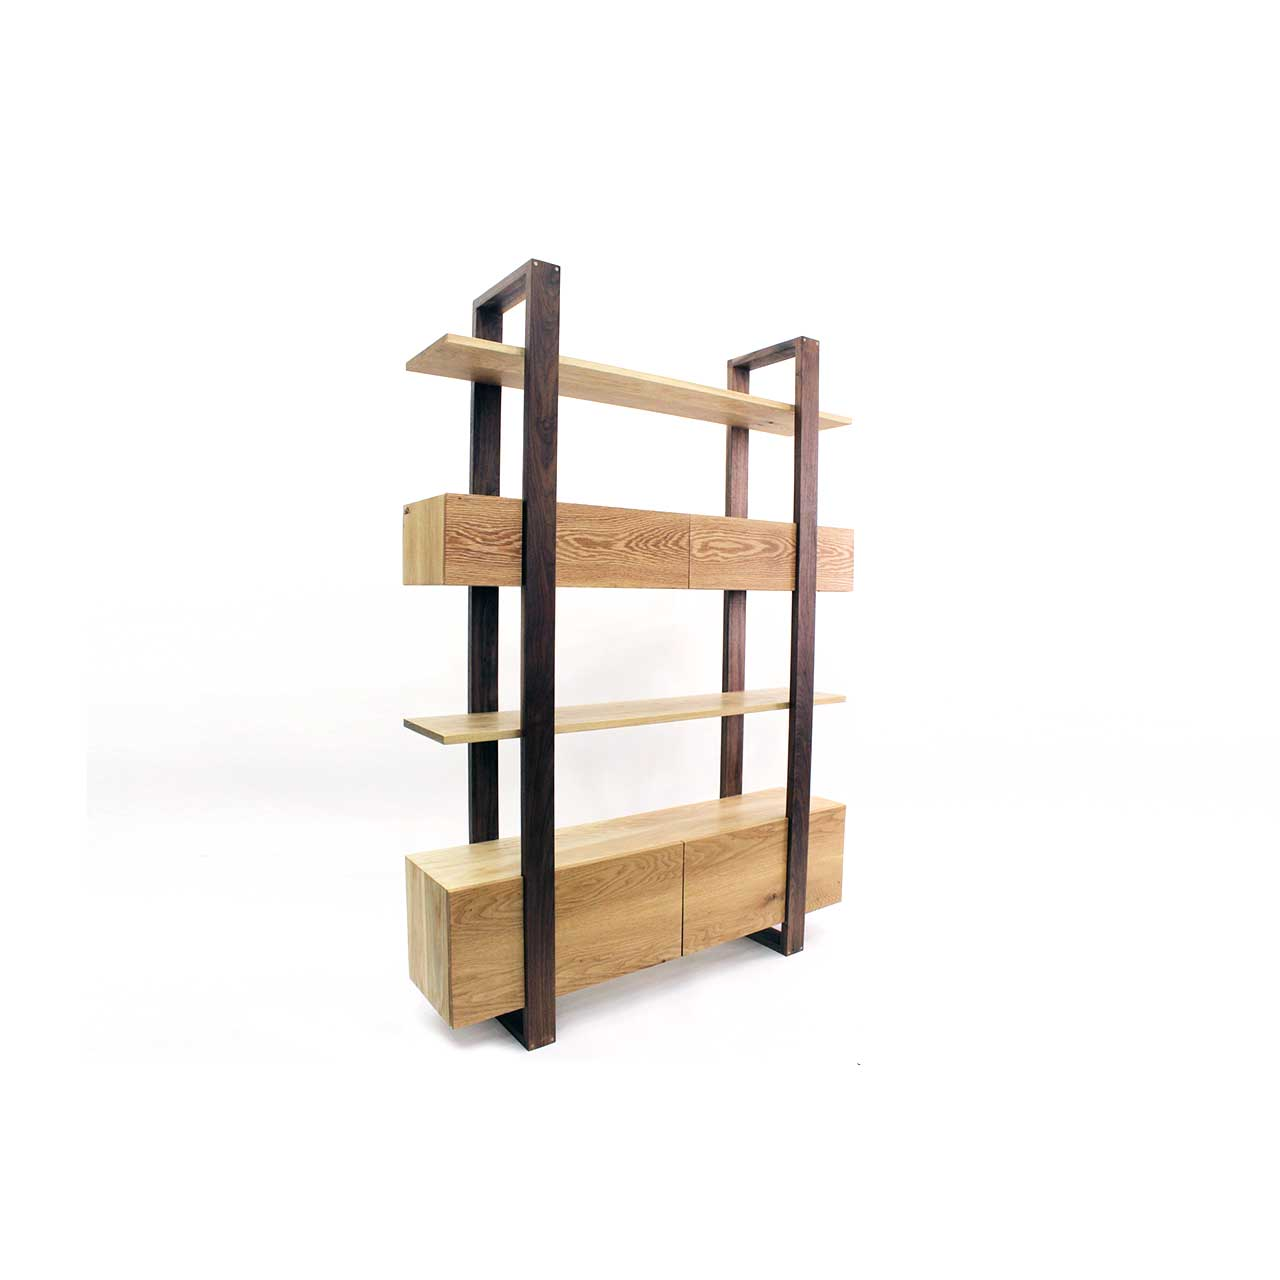 ALCOVE/Shelf 1.0